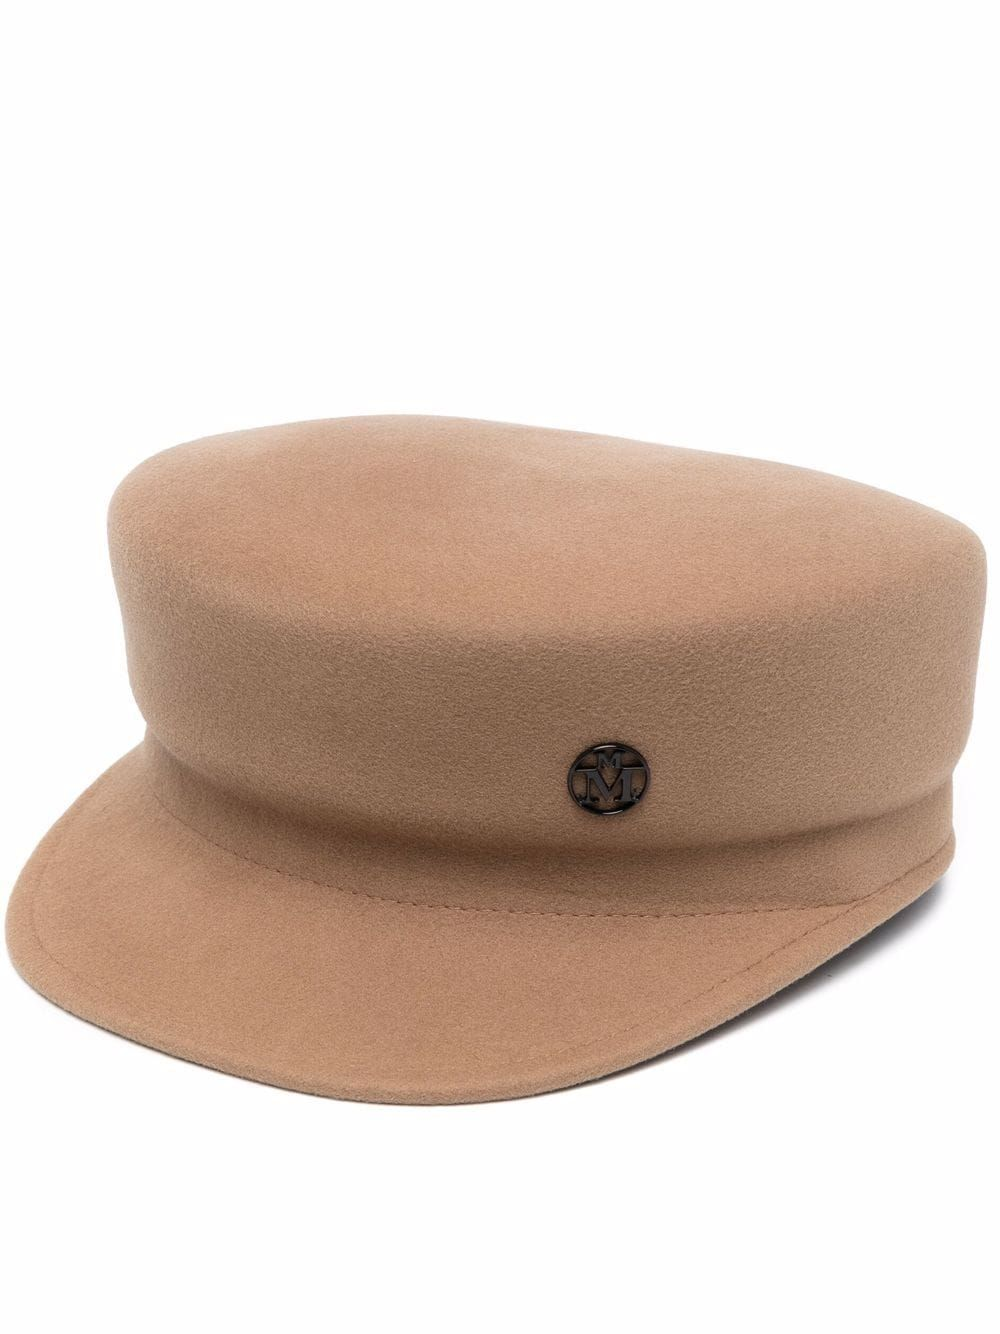 Cappello abby in lana